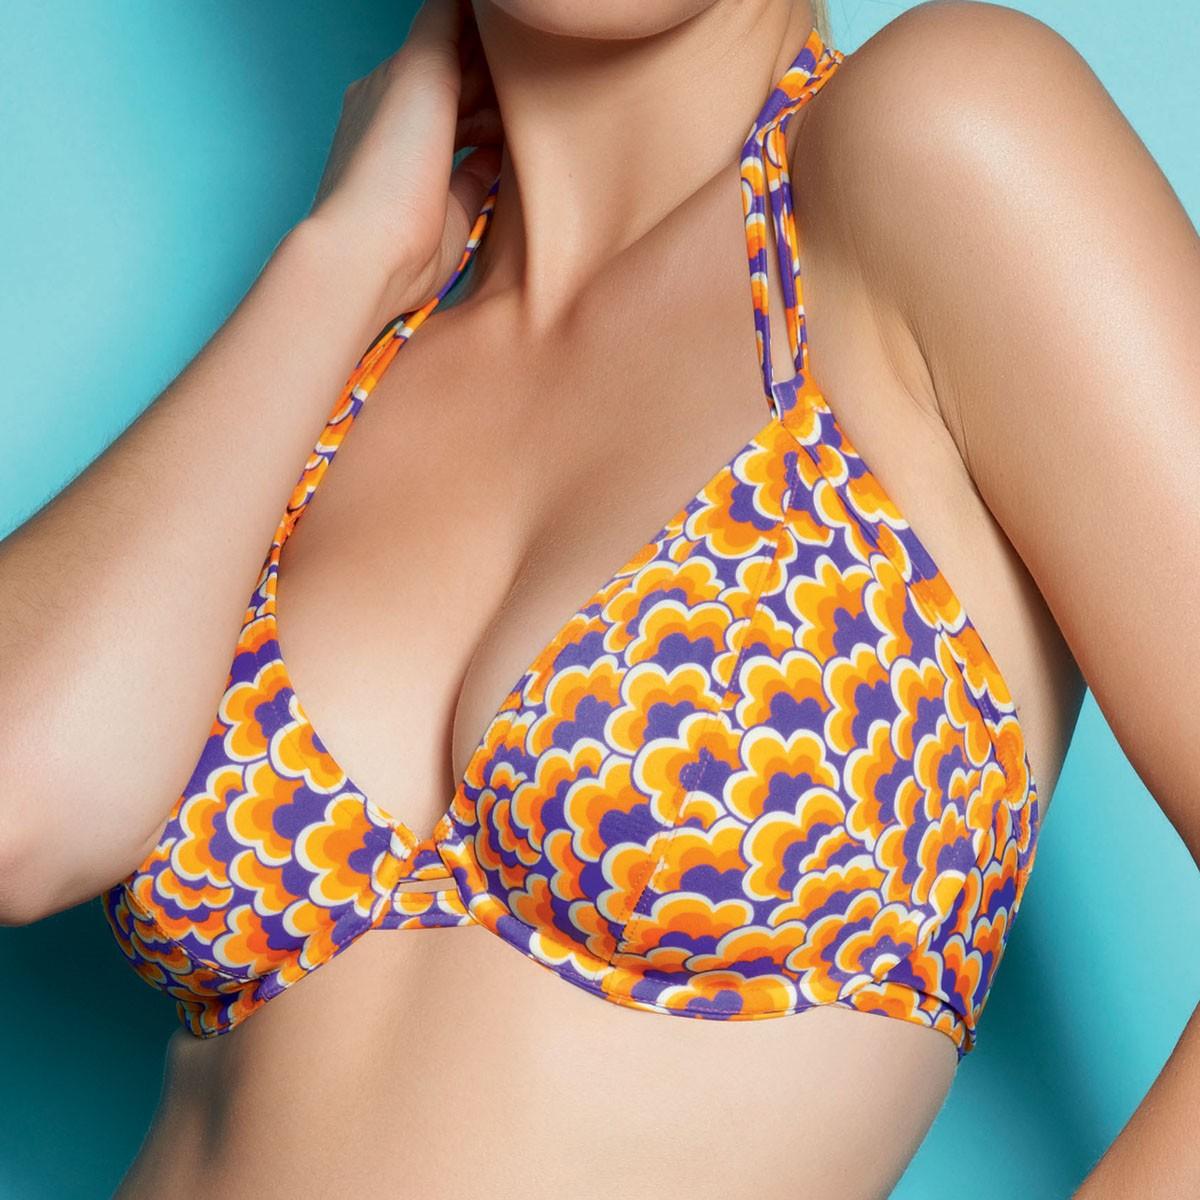 Freya Boogie Triangle Halter Bikini Top - Firefly